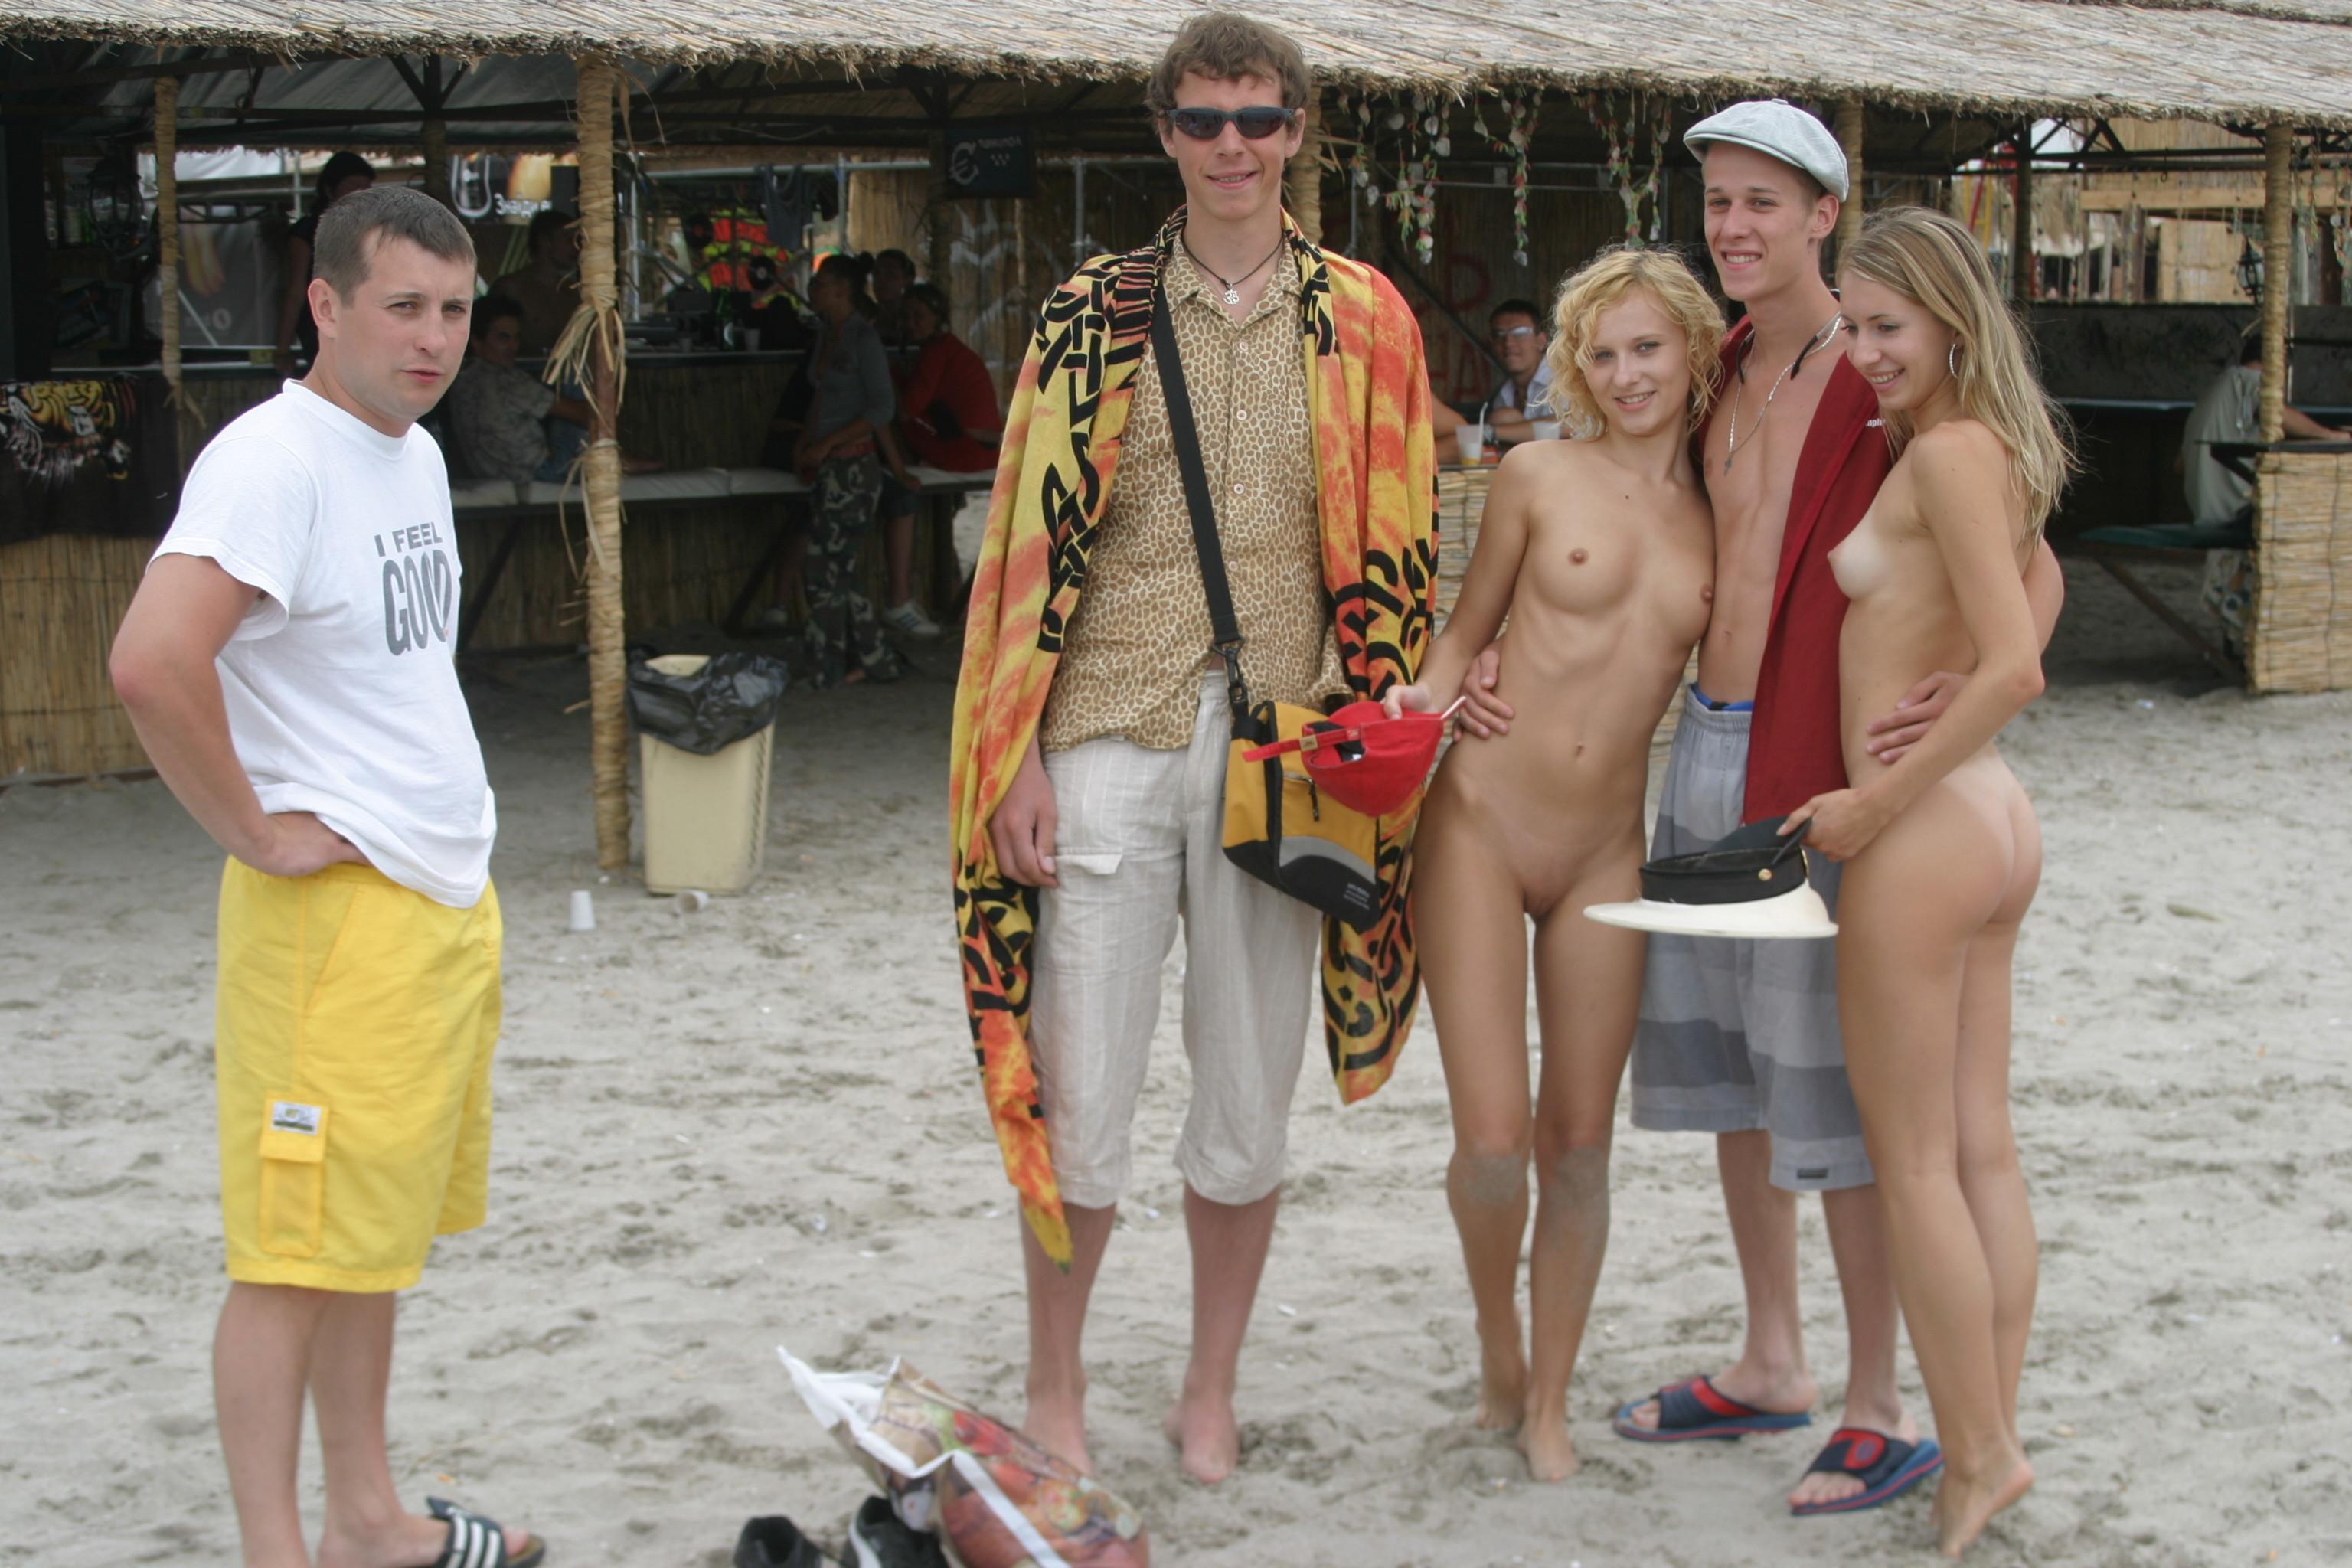 vika-y-lena-l-beach-nude-in-public-metart-31